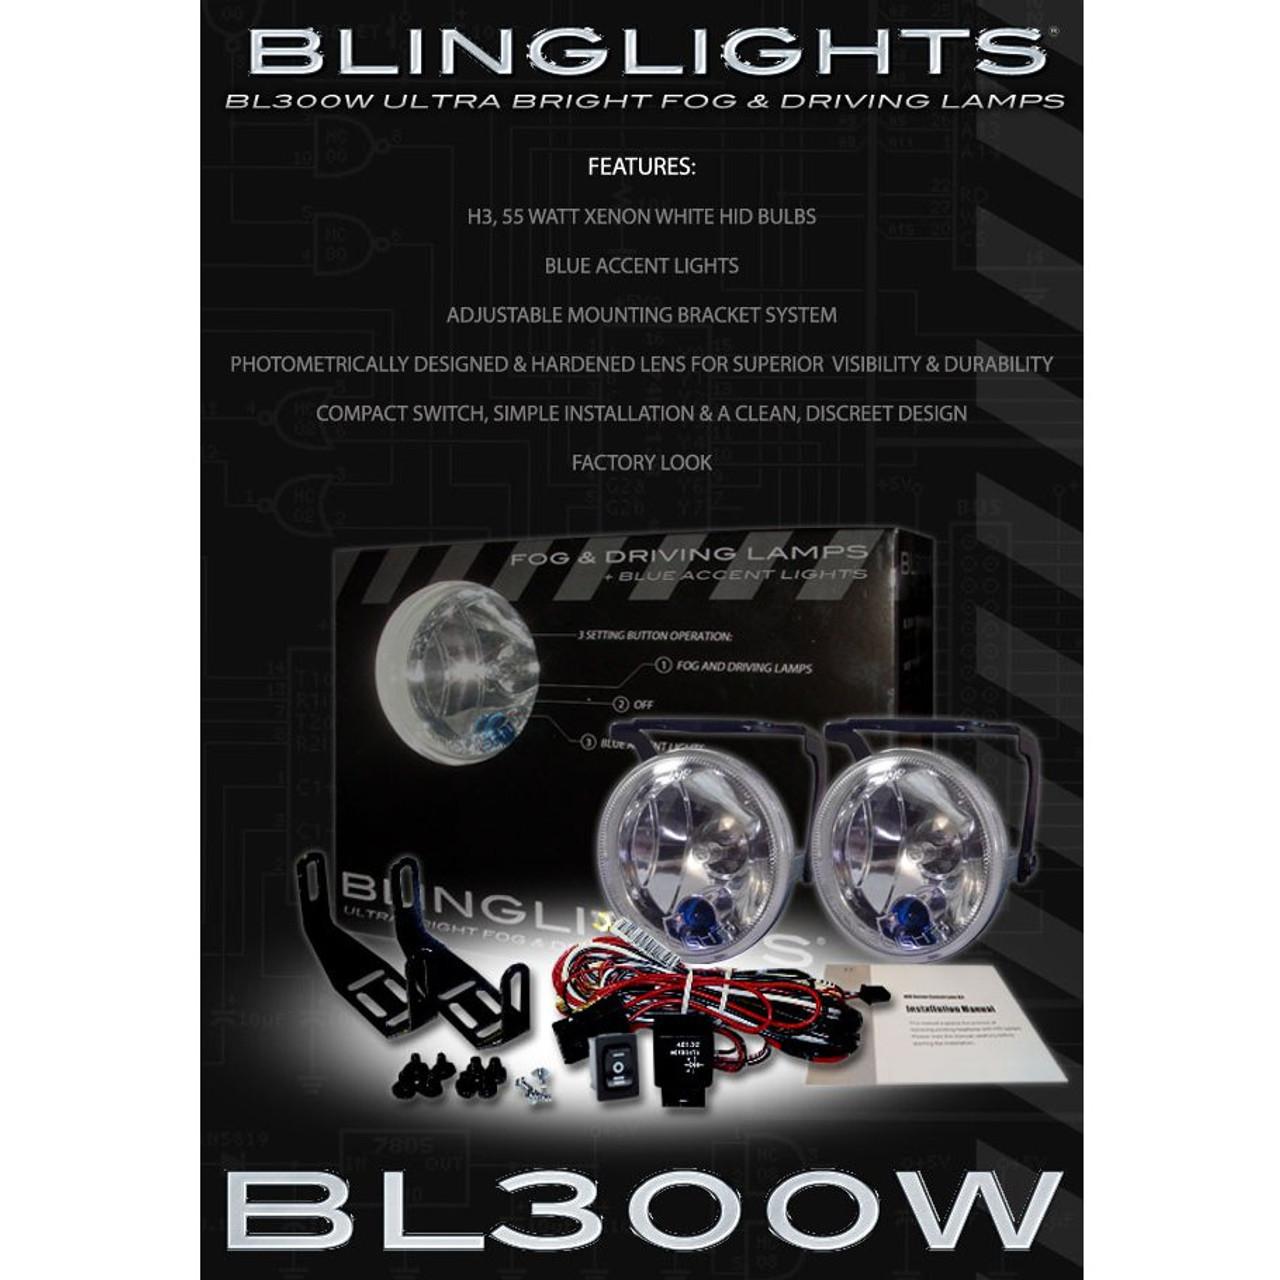 Xenon Halogen Fog Lamps Driving Light foglights Kit For 2011-2014 VW Touareg